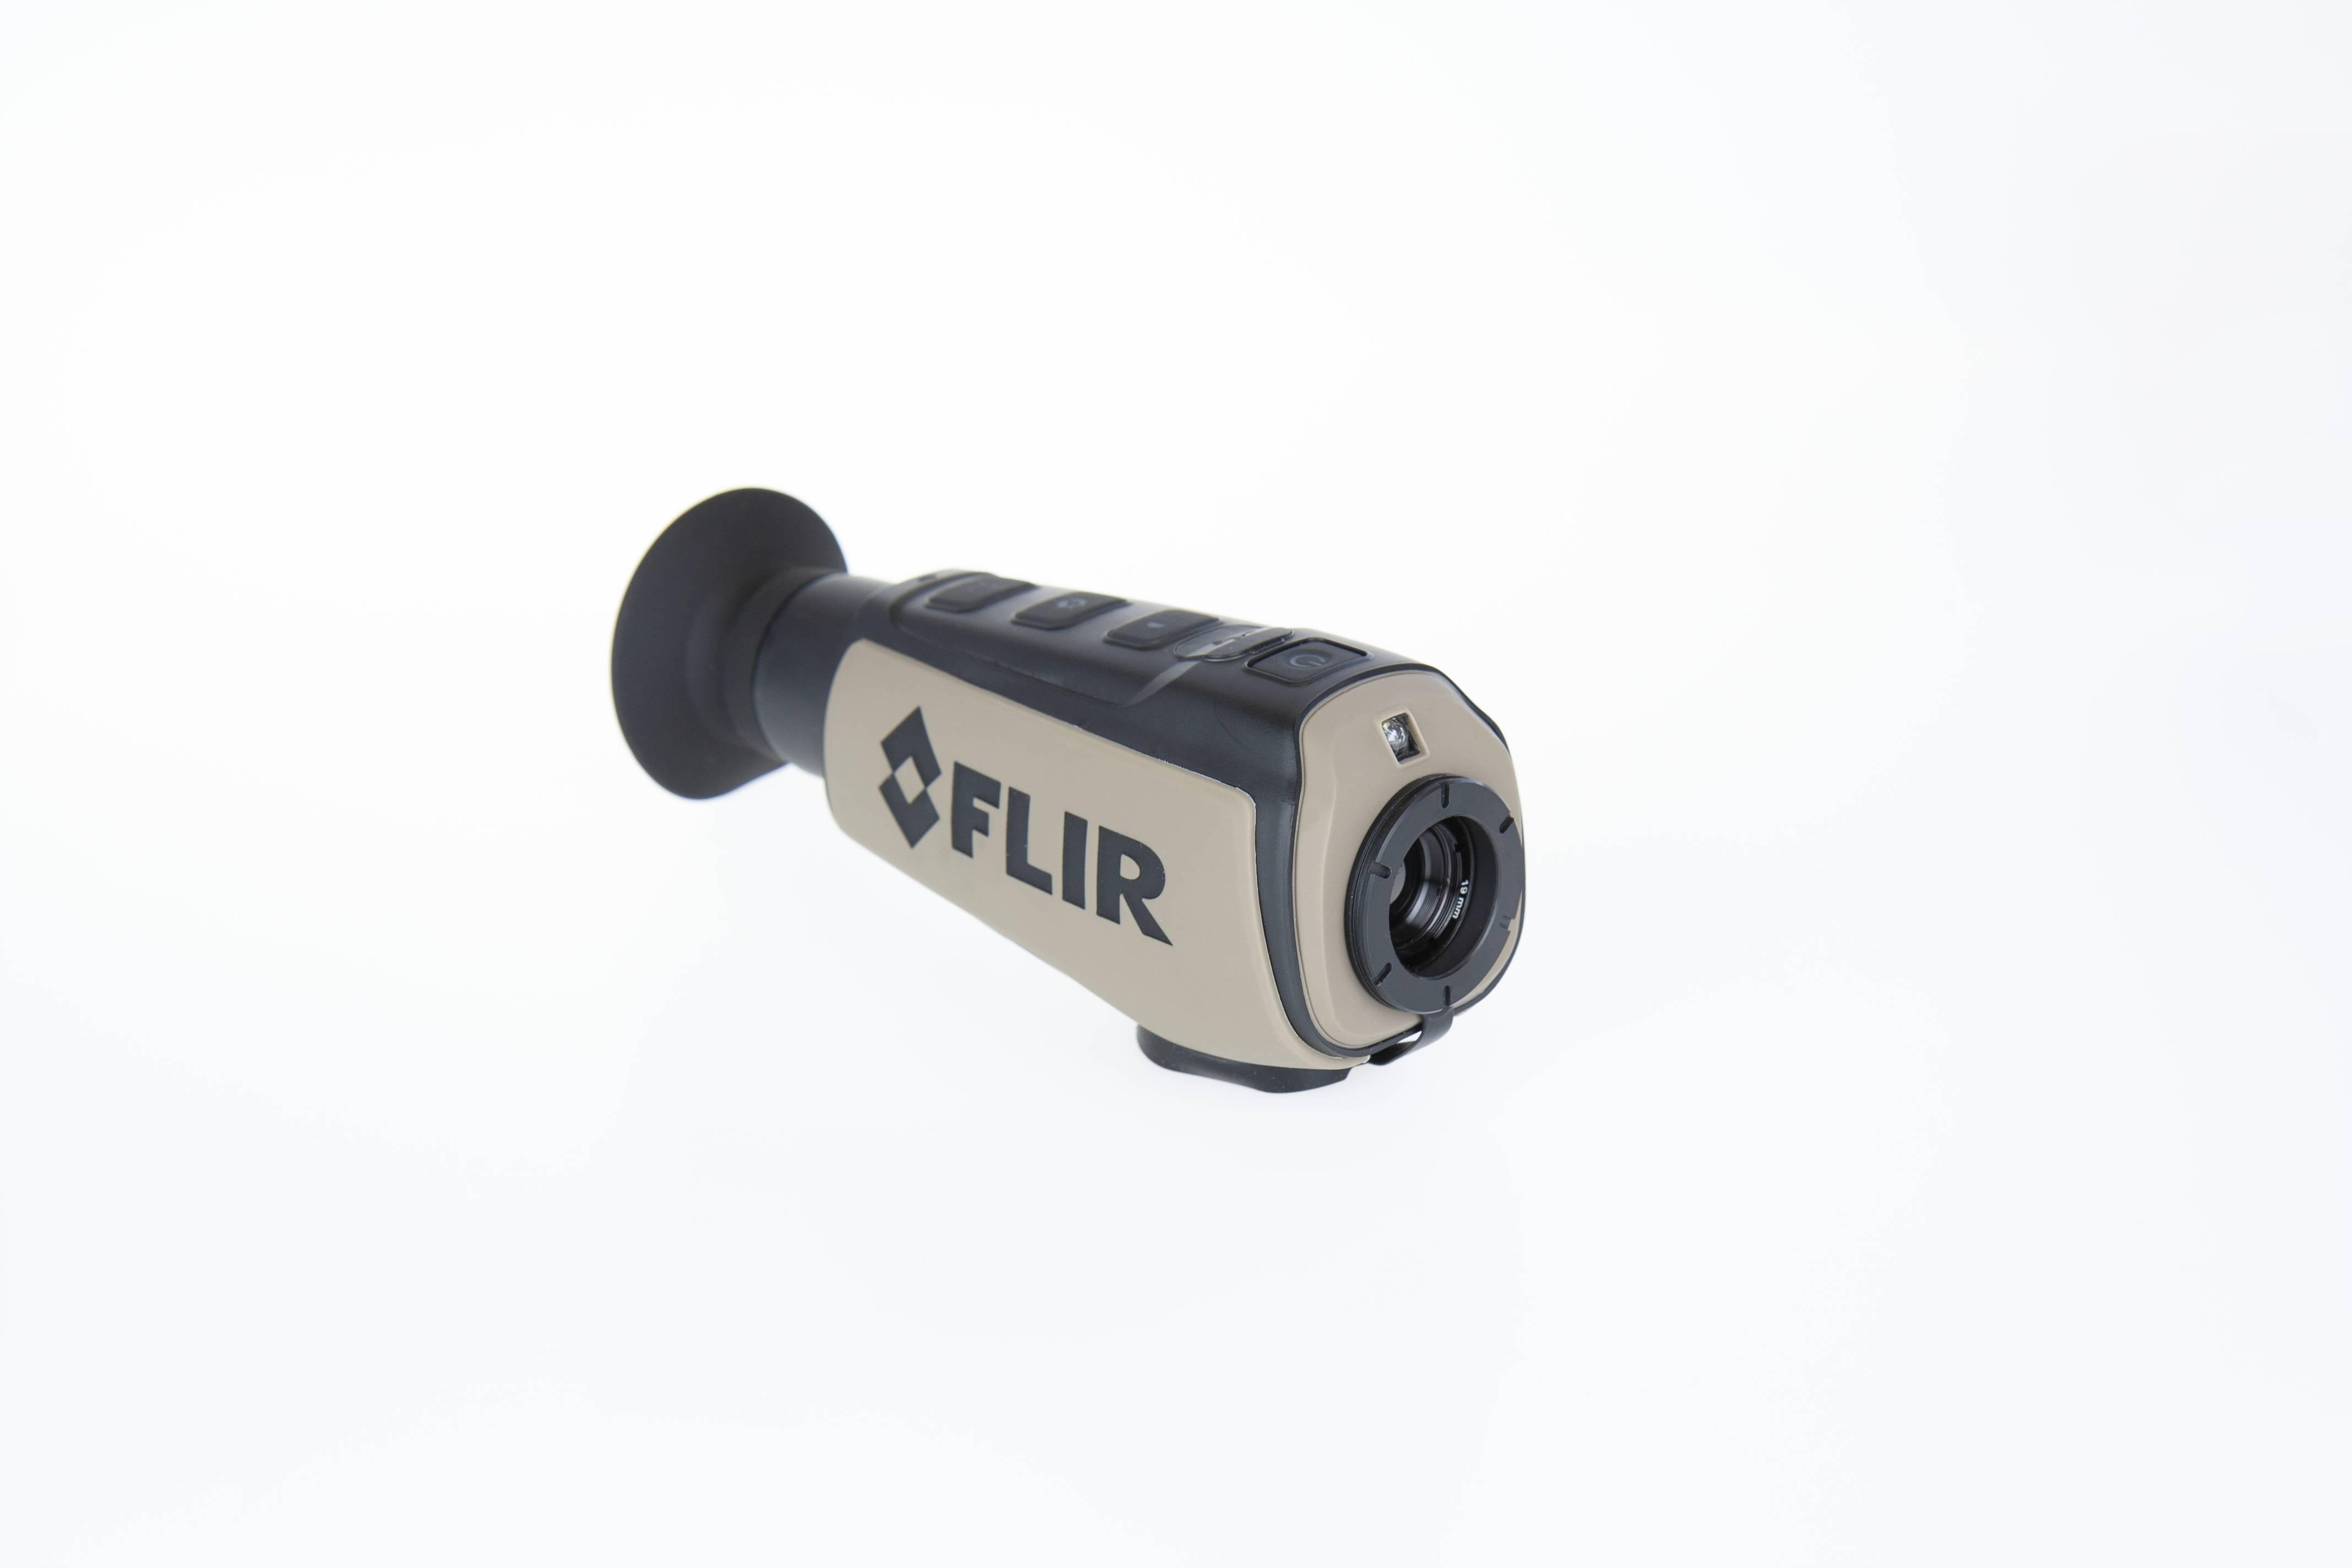 Nikon Entfernungsmesser Aculon Al11 Bedienungsanleitung : Nikon laser entfernungsmesser aculon: fernglas.